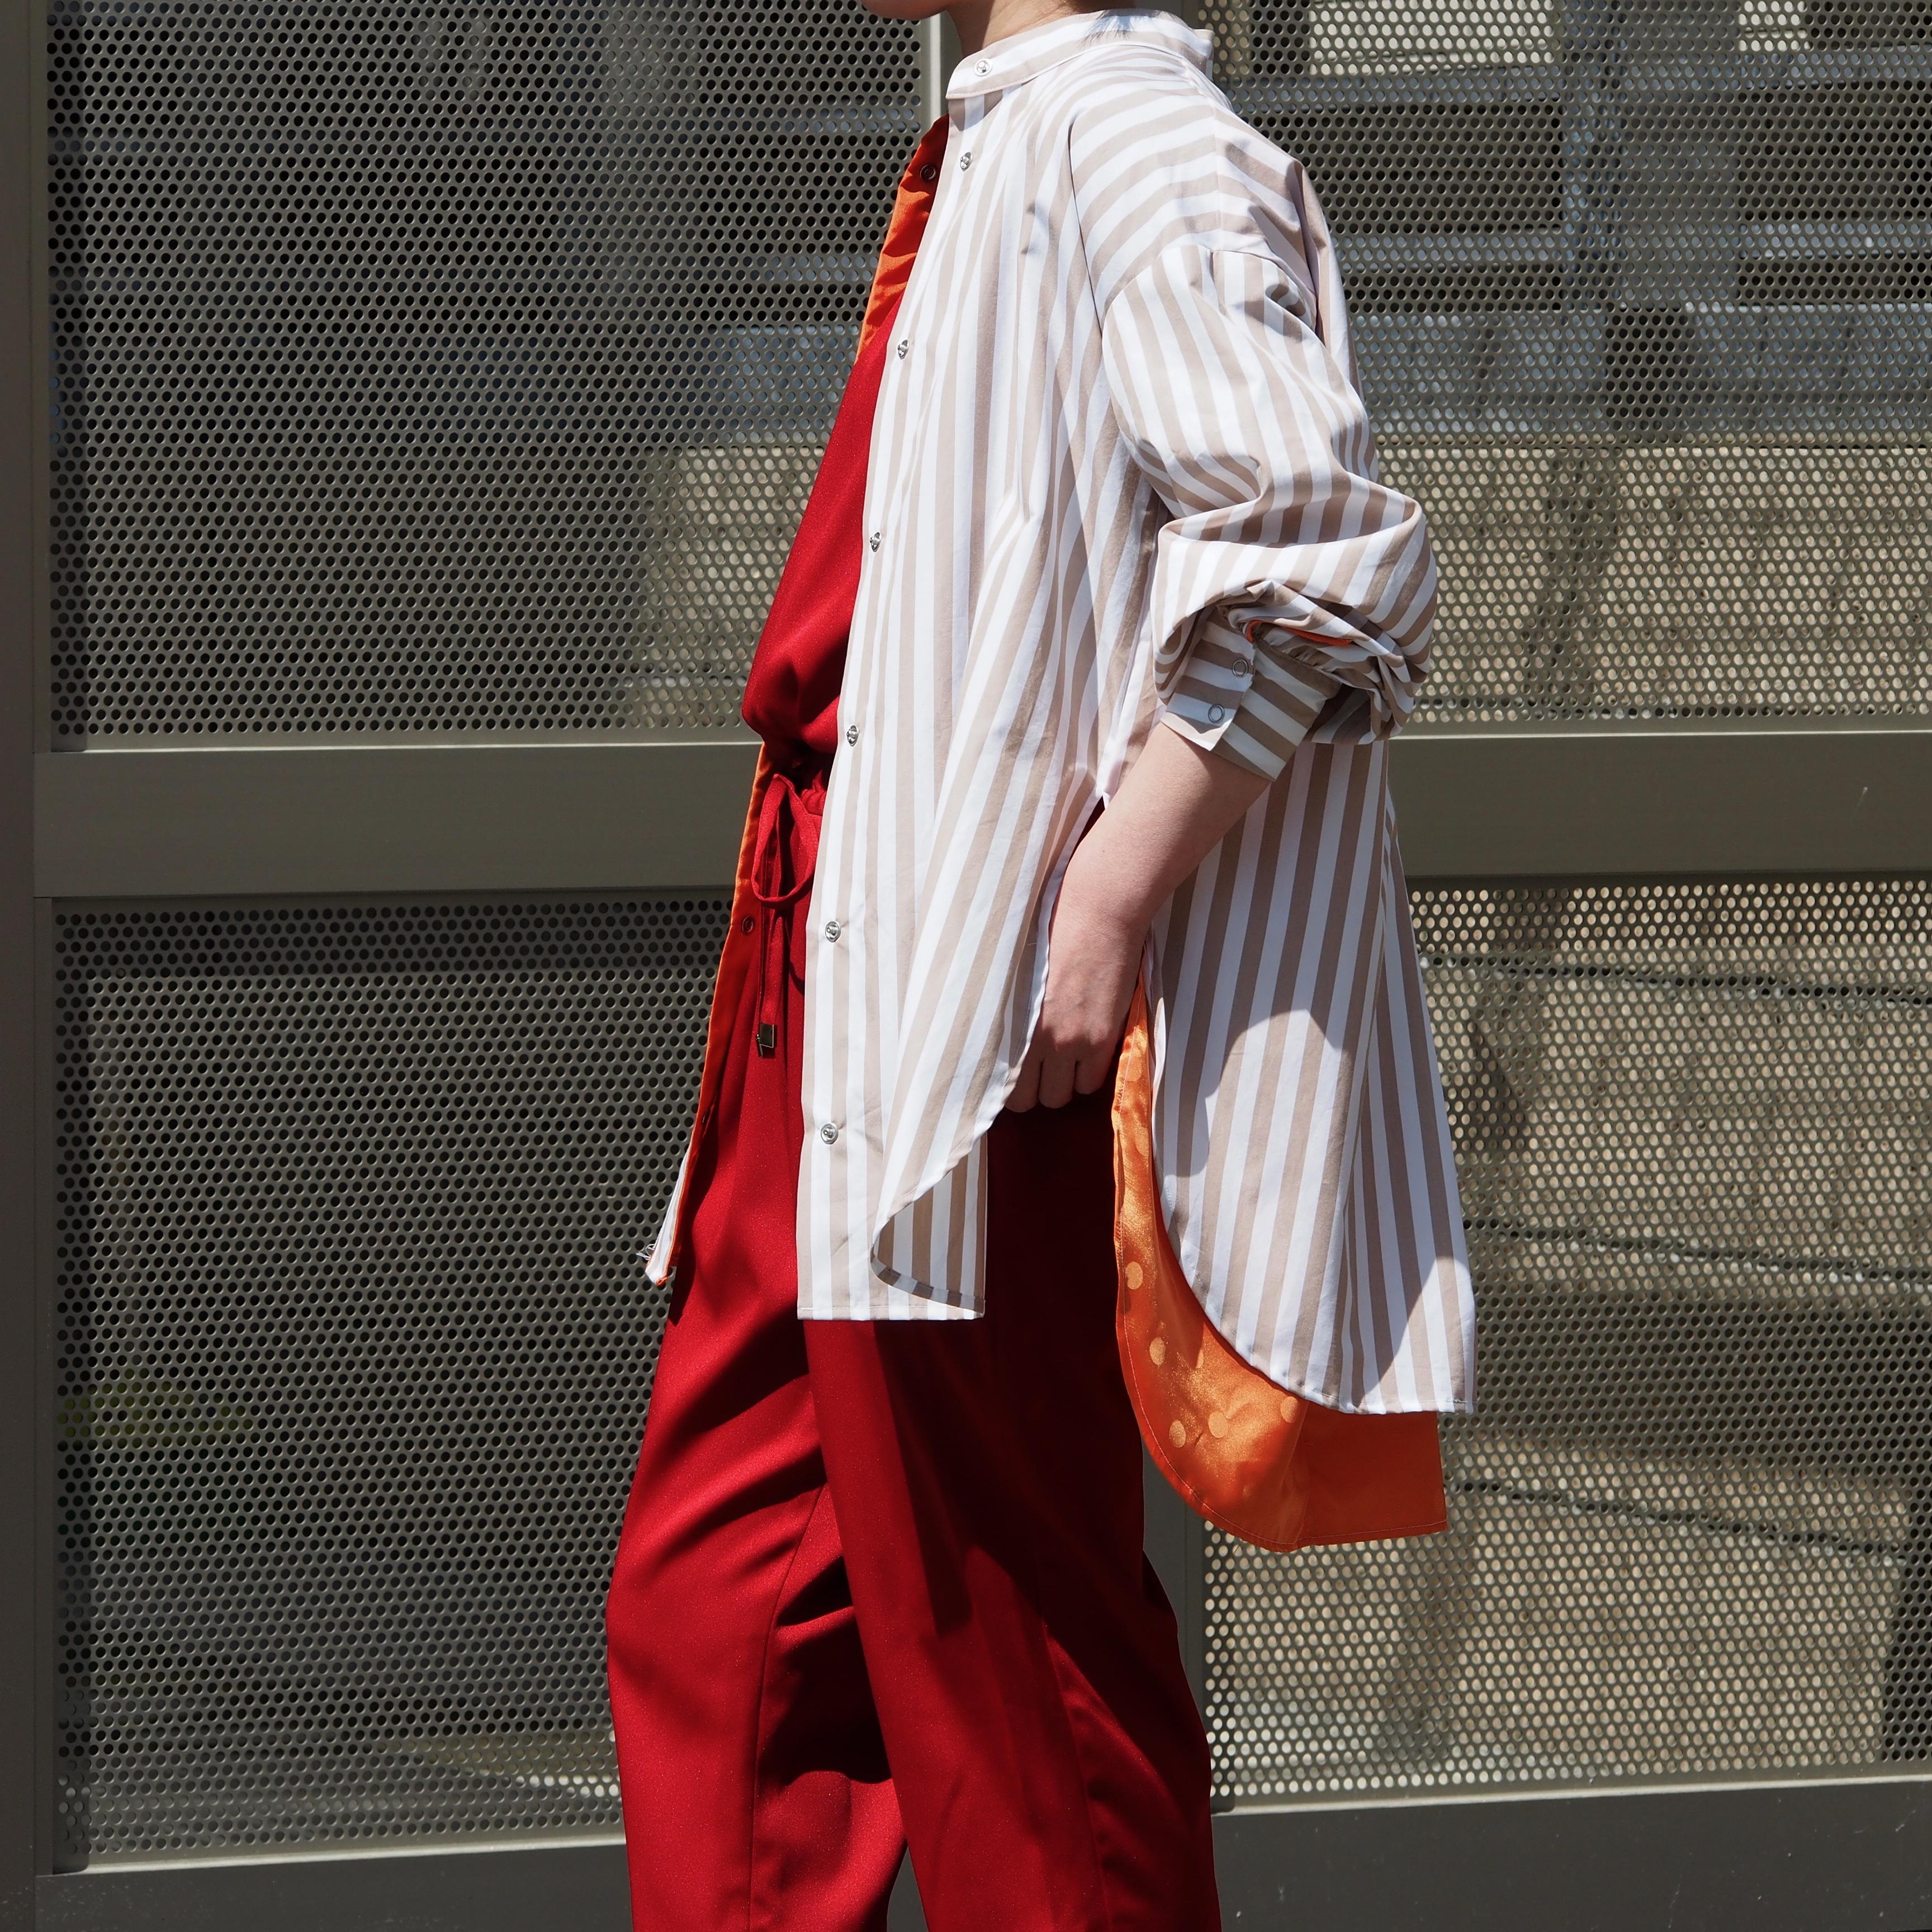 【sandglass】transform shirt(beige) / 【サンドグラス】トランスフォーム シャツ(ベージュ)